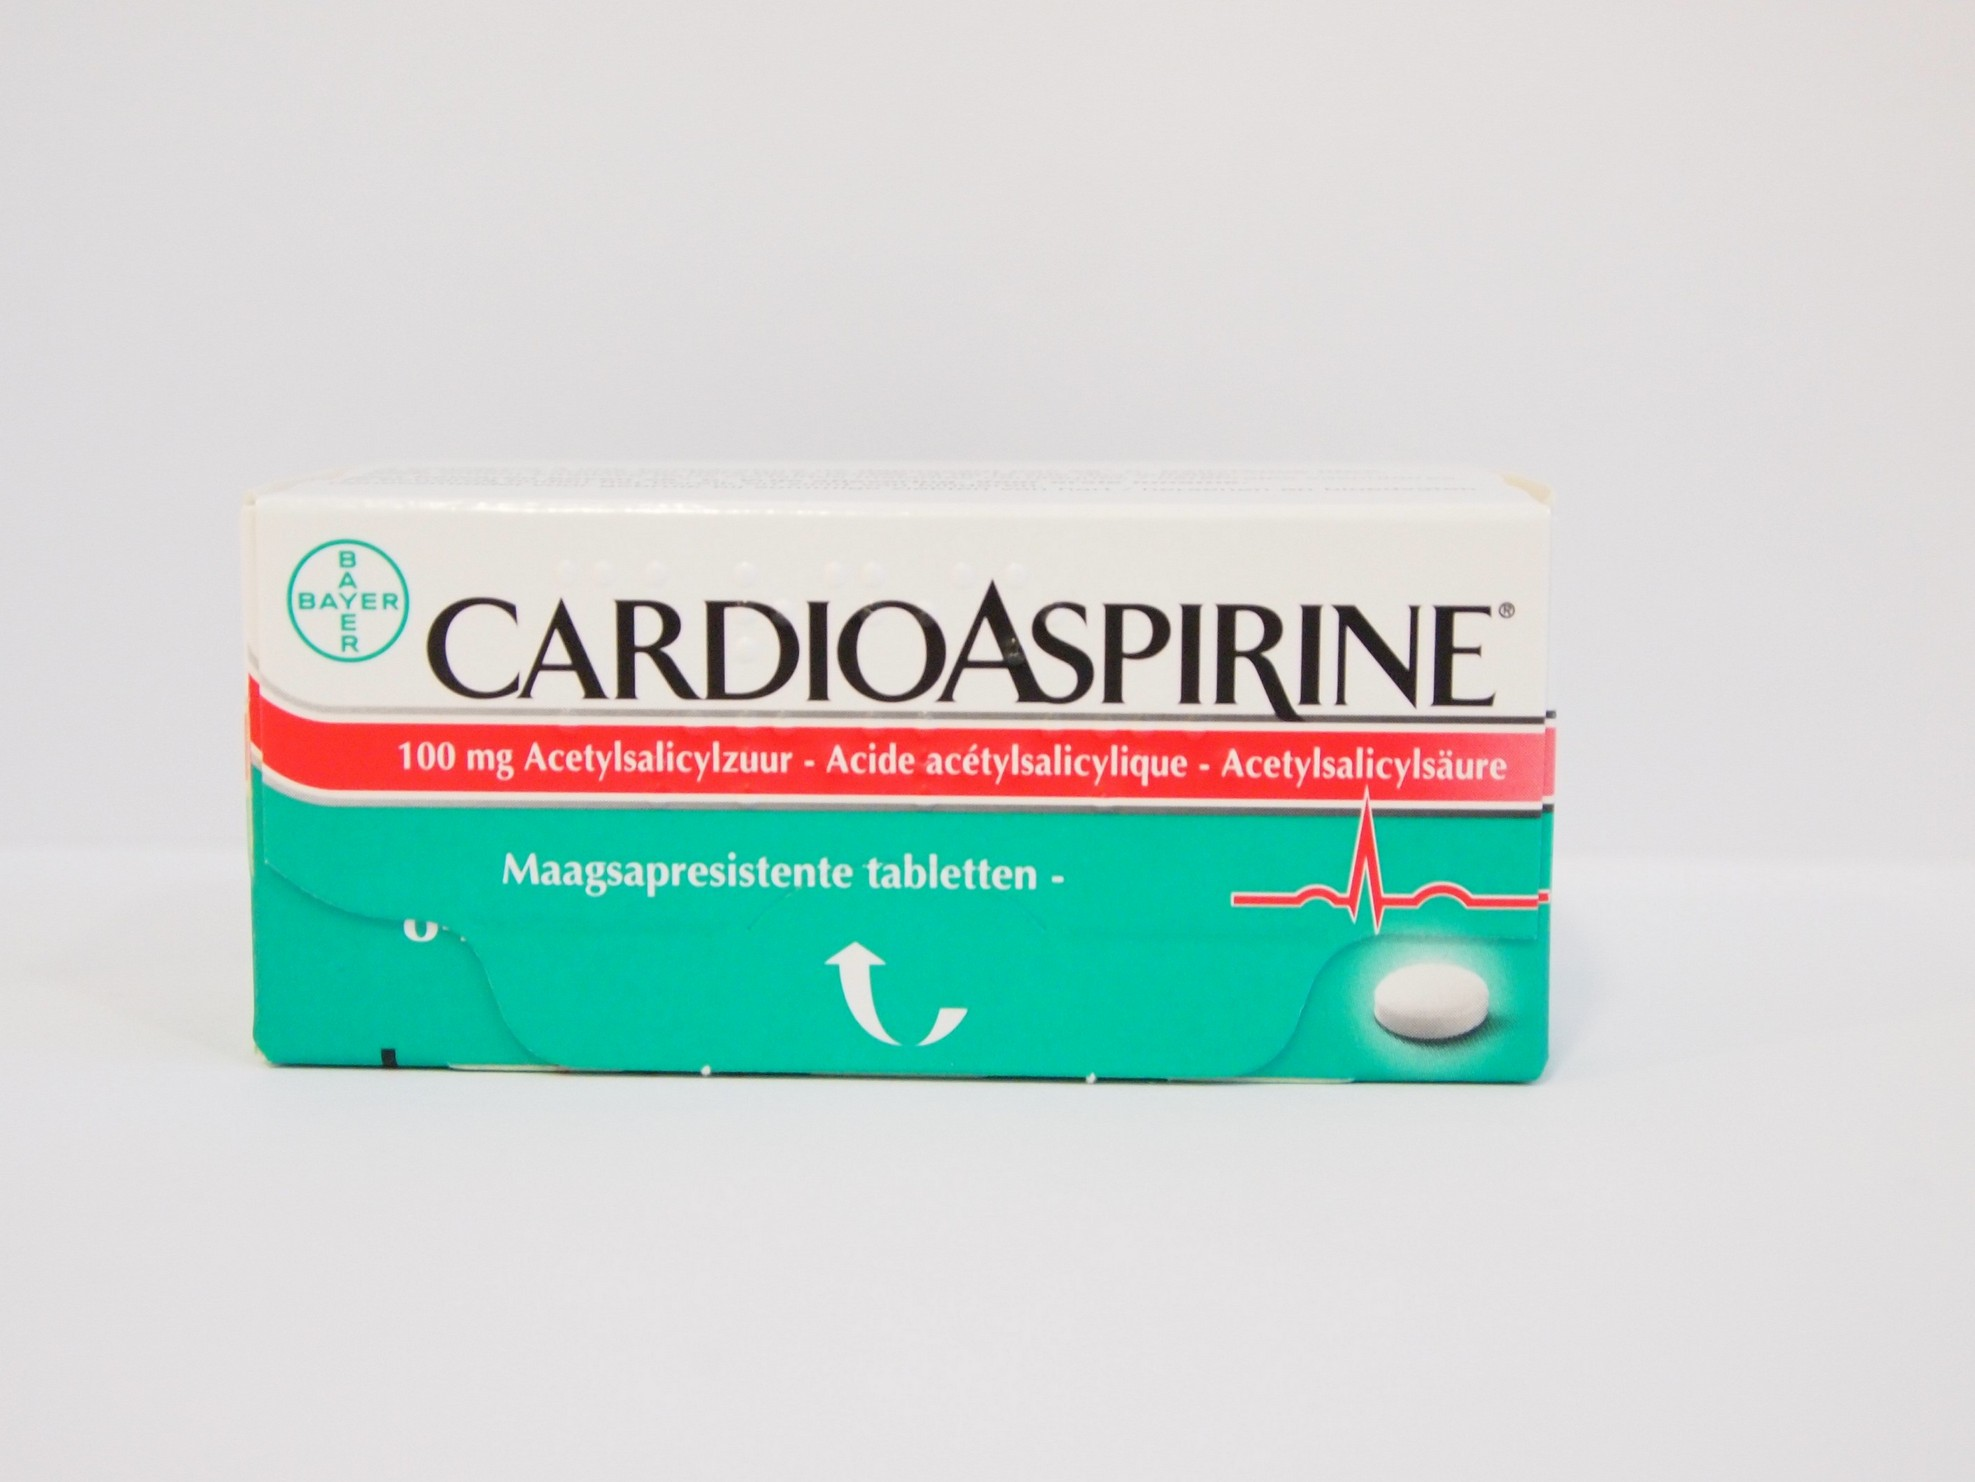 Aspirin Pregnancy and Breastfeeding Warnings